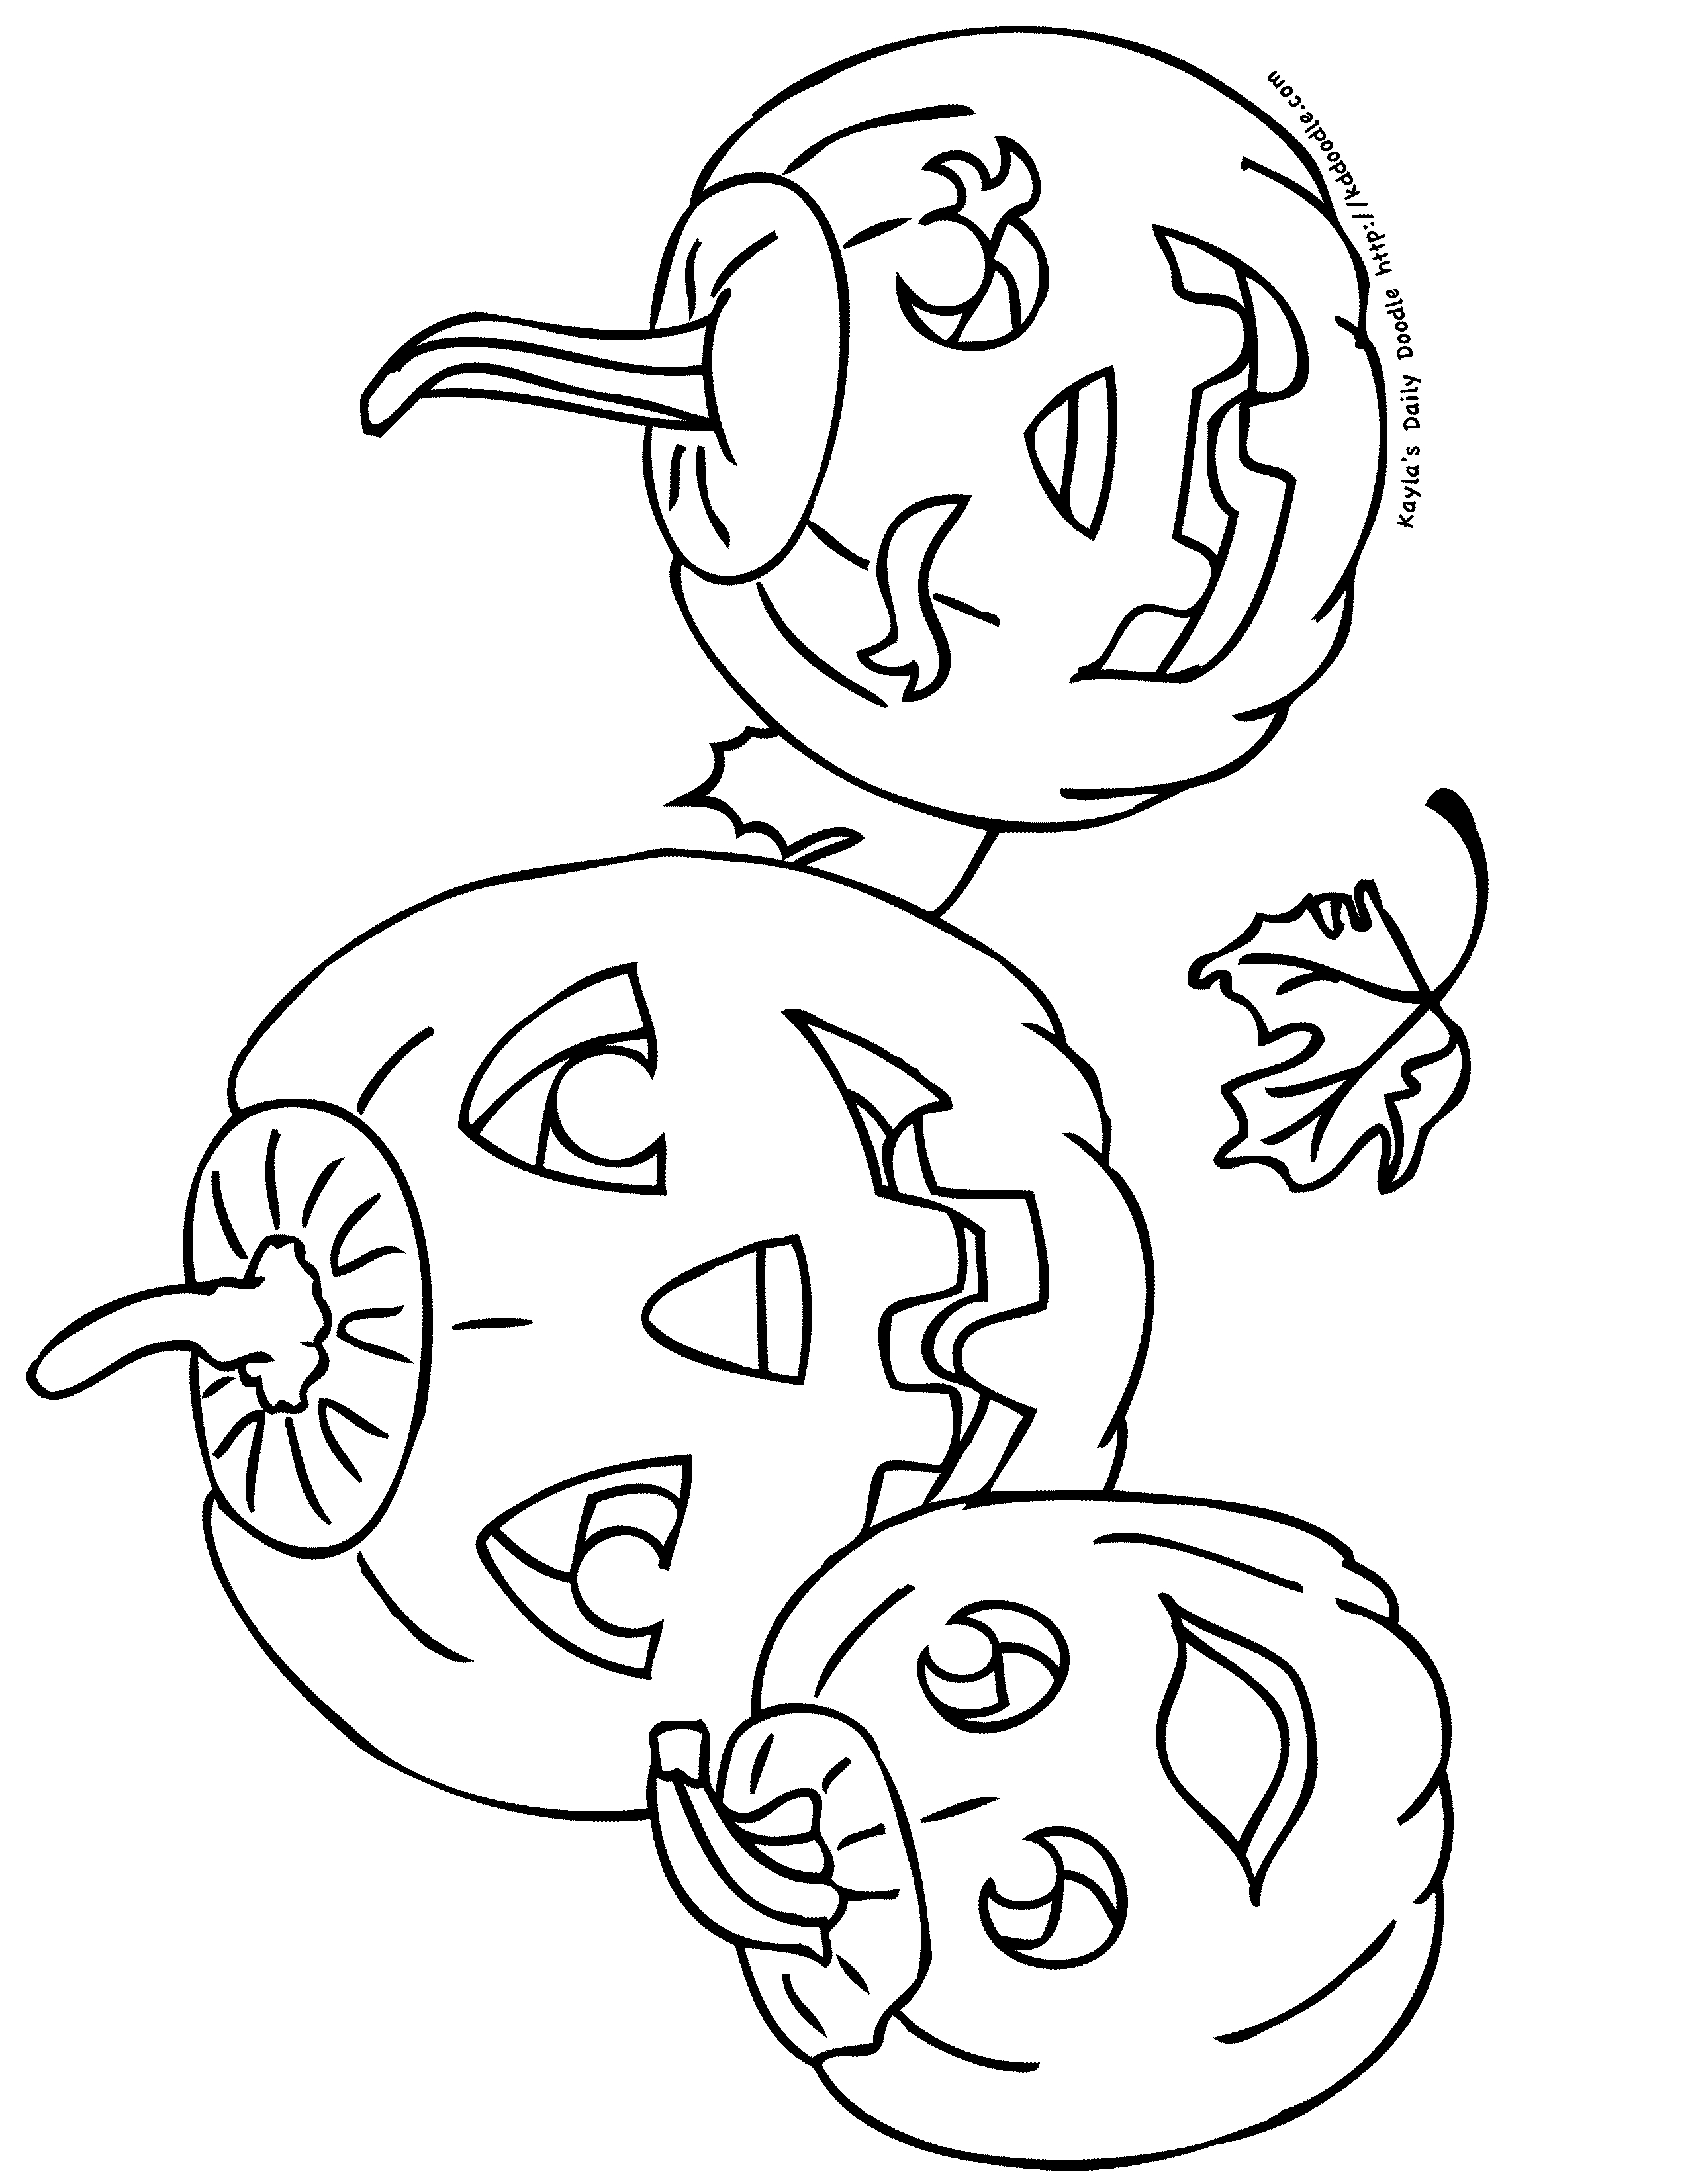 Jack O Lantern Drawing Patterns At Getdrawings